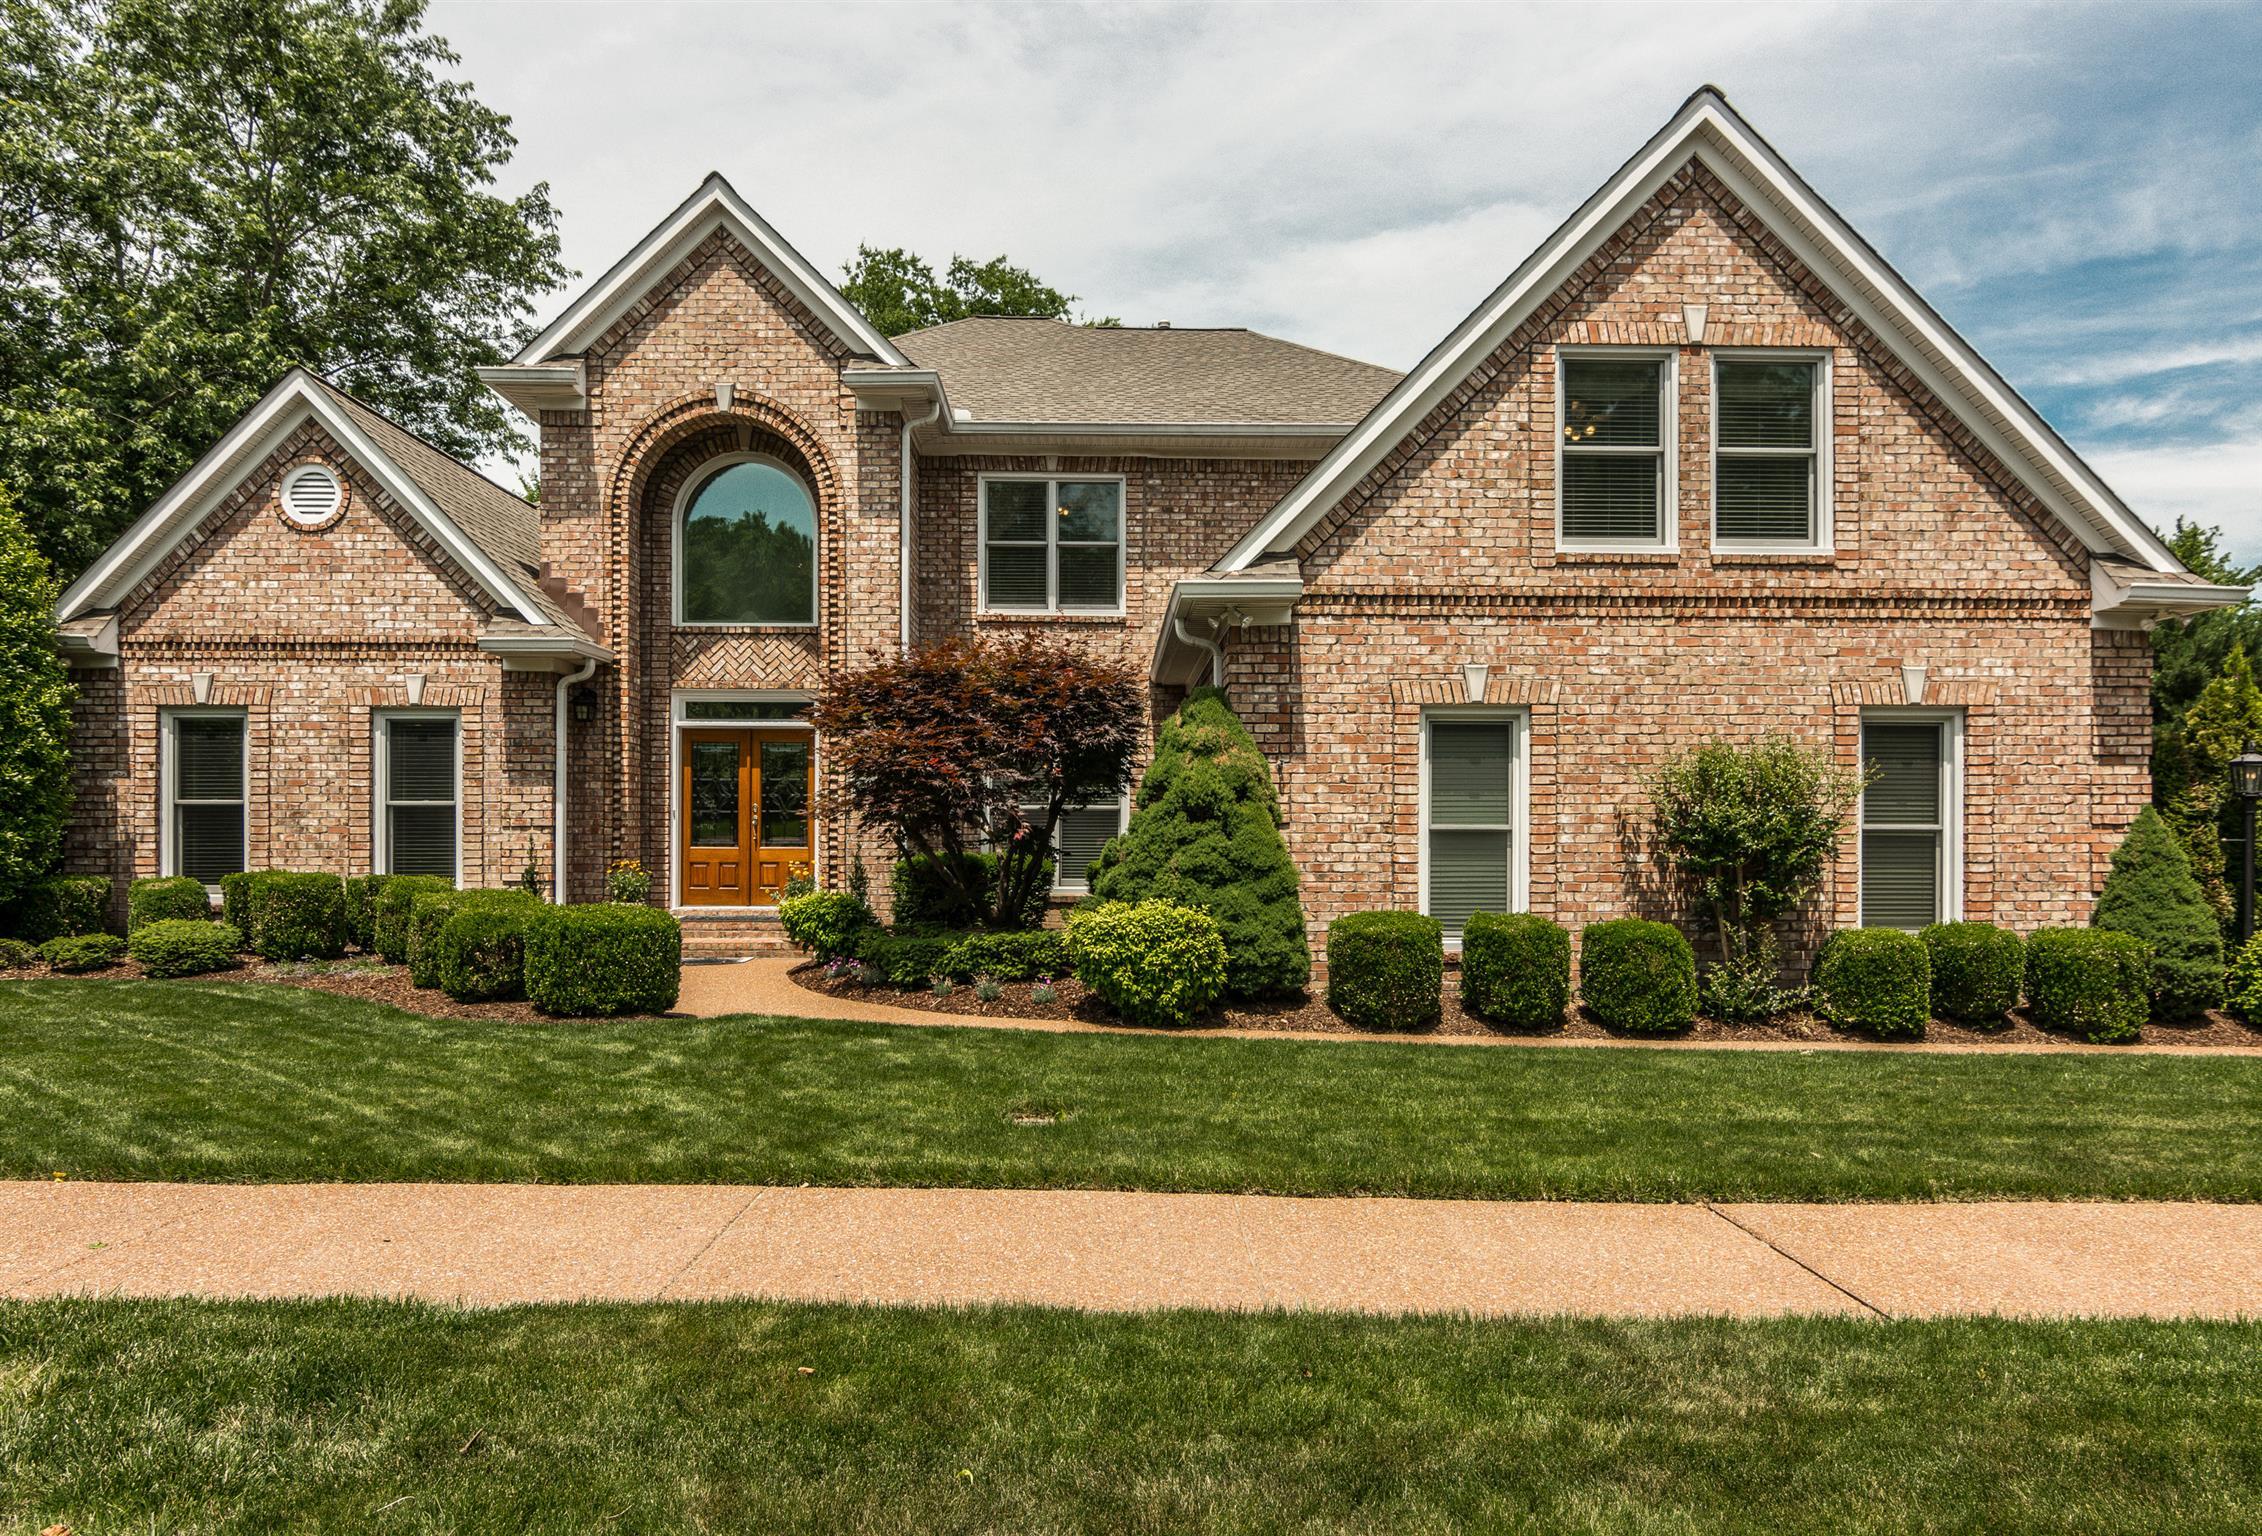 204 Halberton Dr, Franklin, TN 37069 - Franklin, TN real estate listing